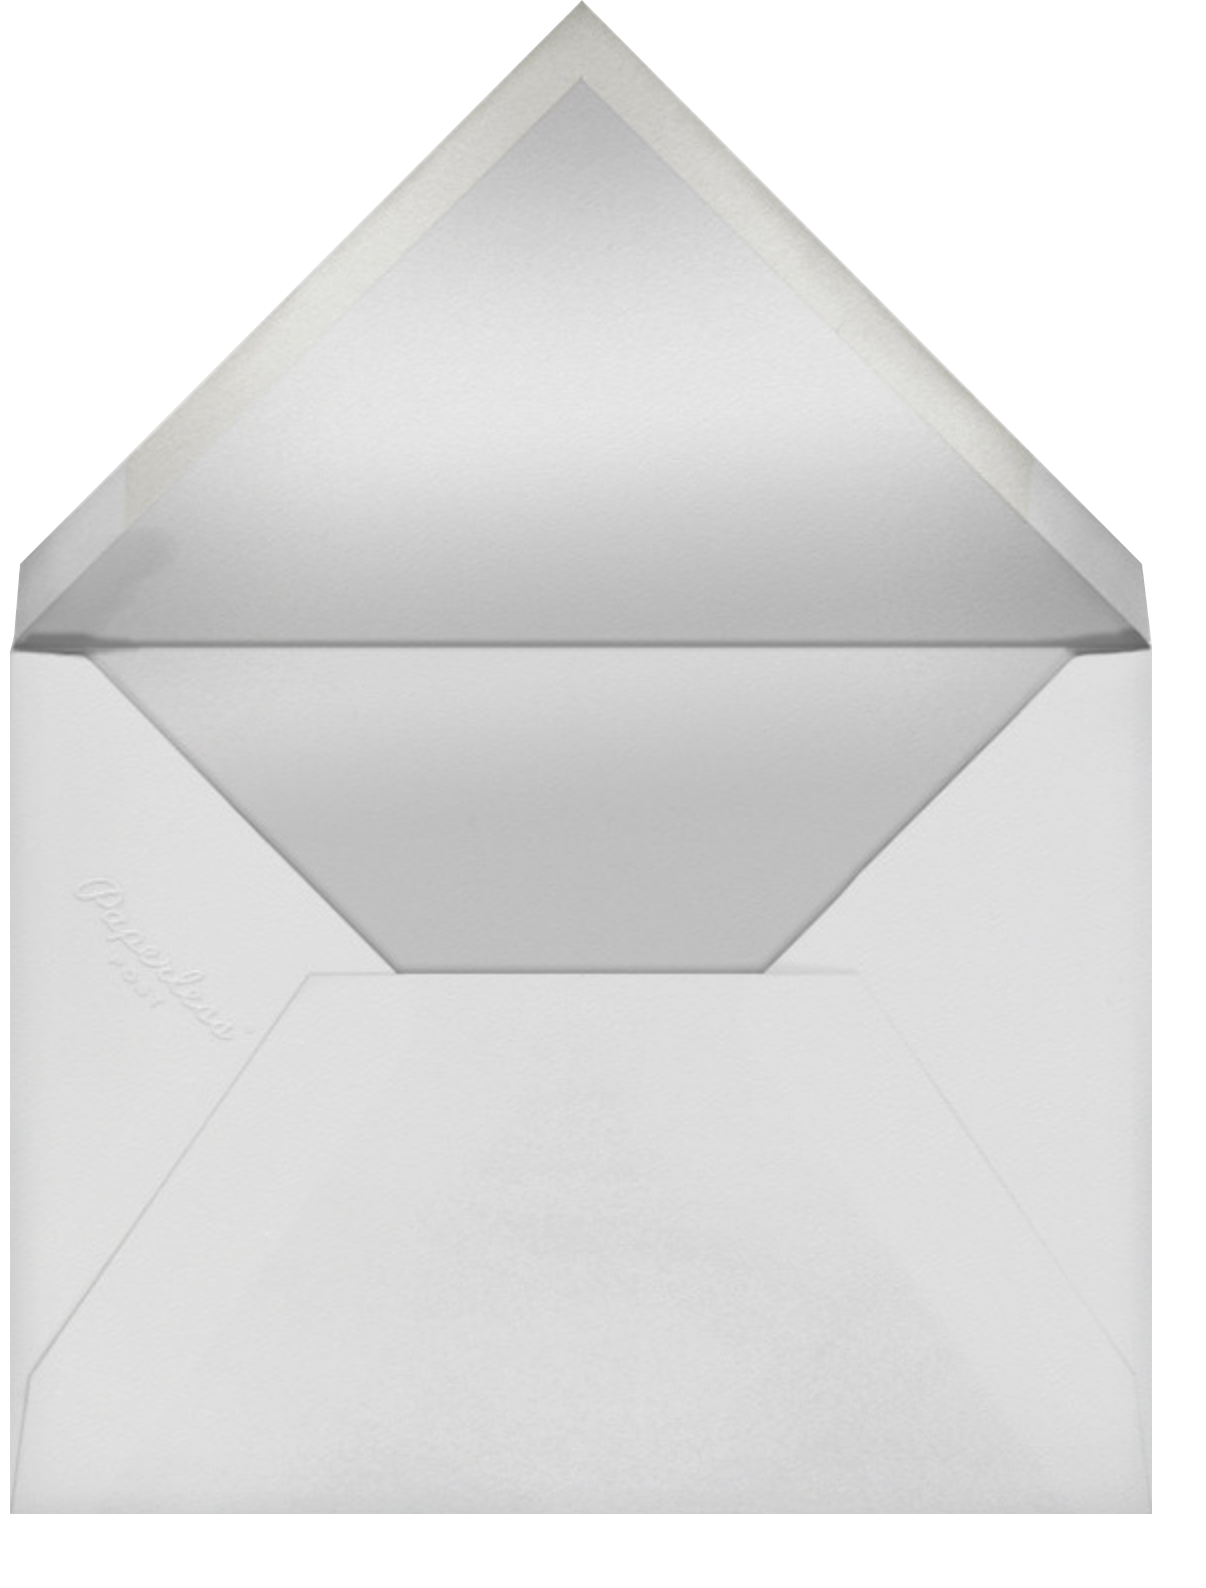 Rocking Horse - Paperless Post - Baby shower - envelope back